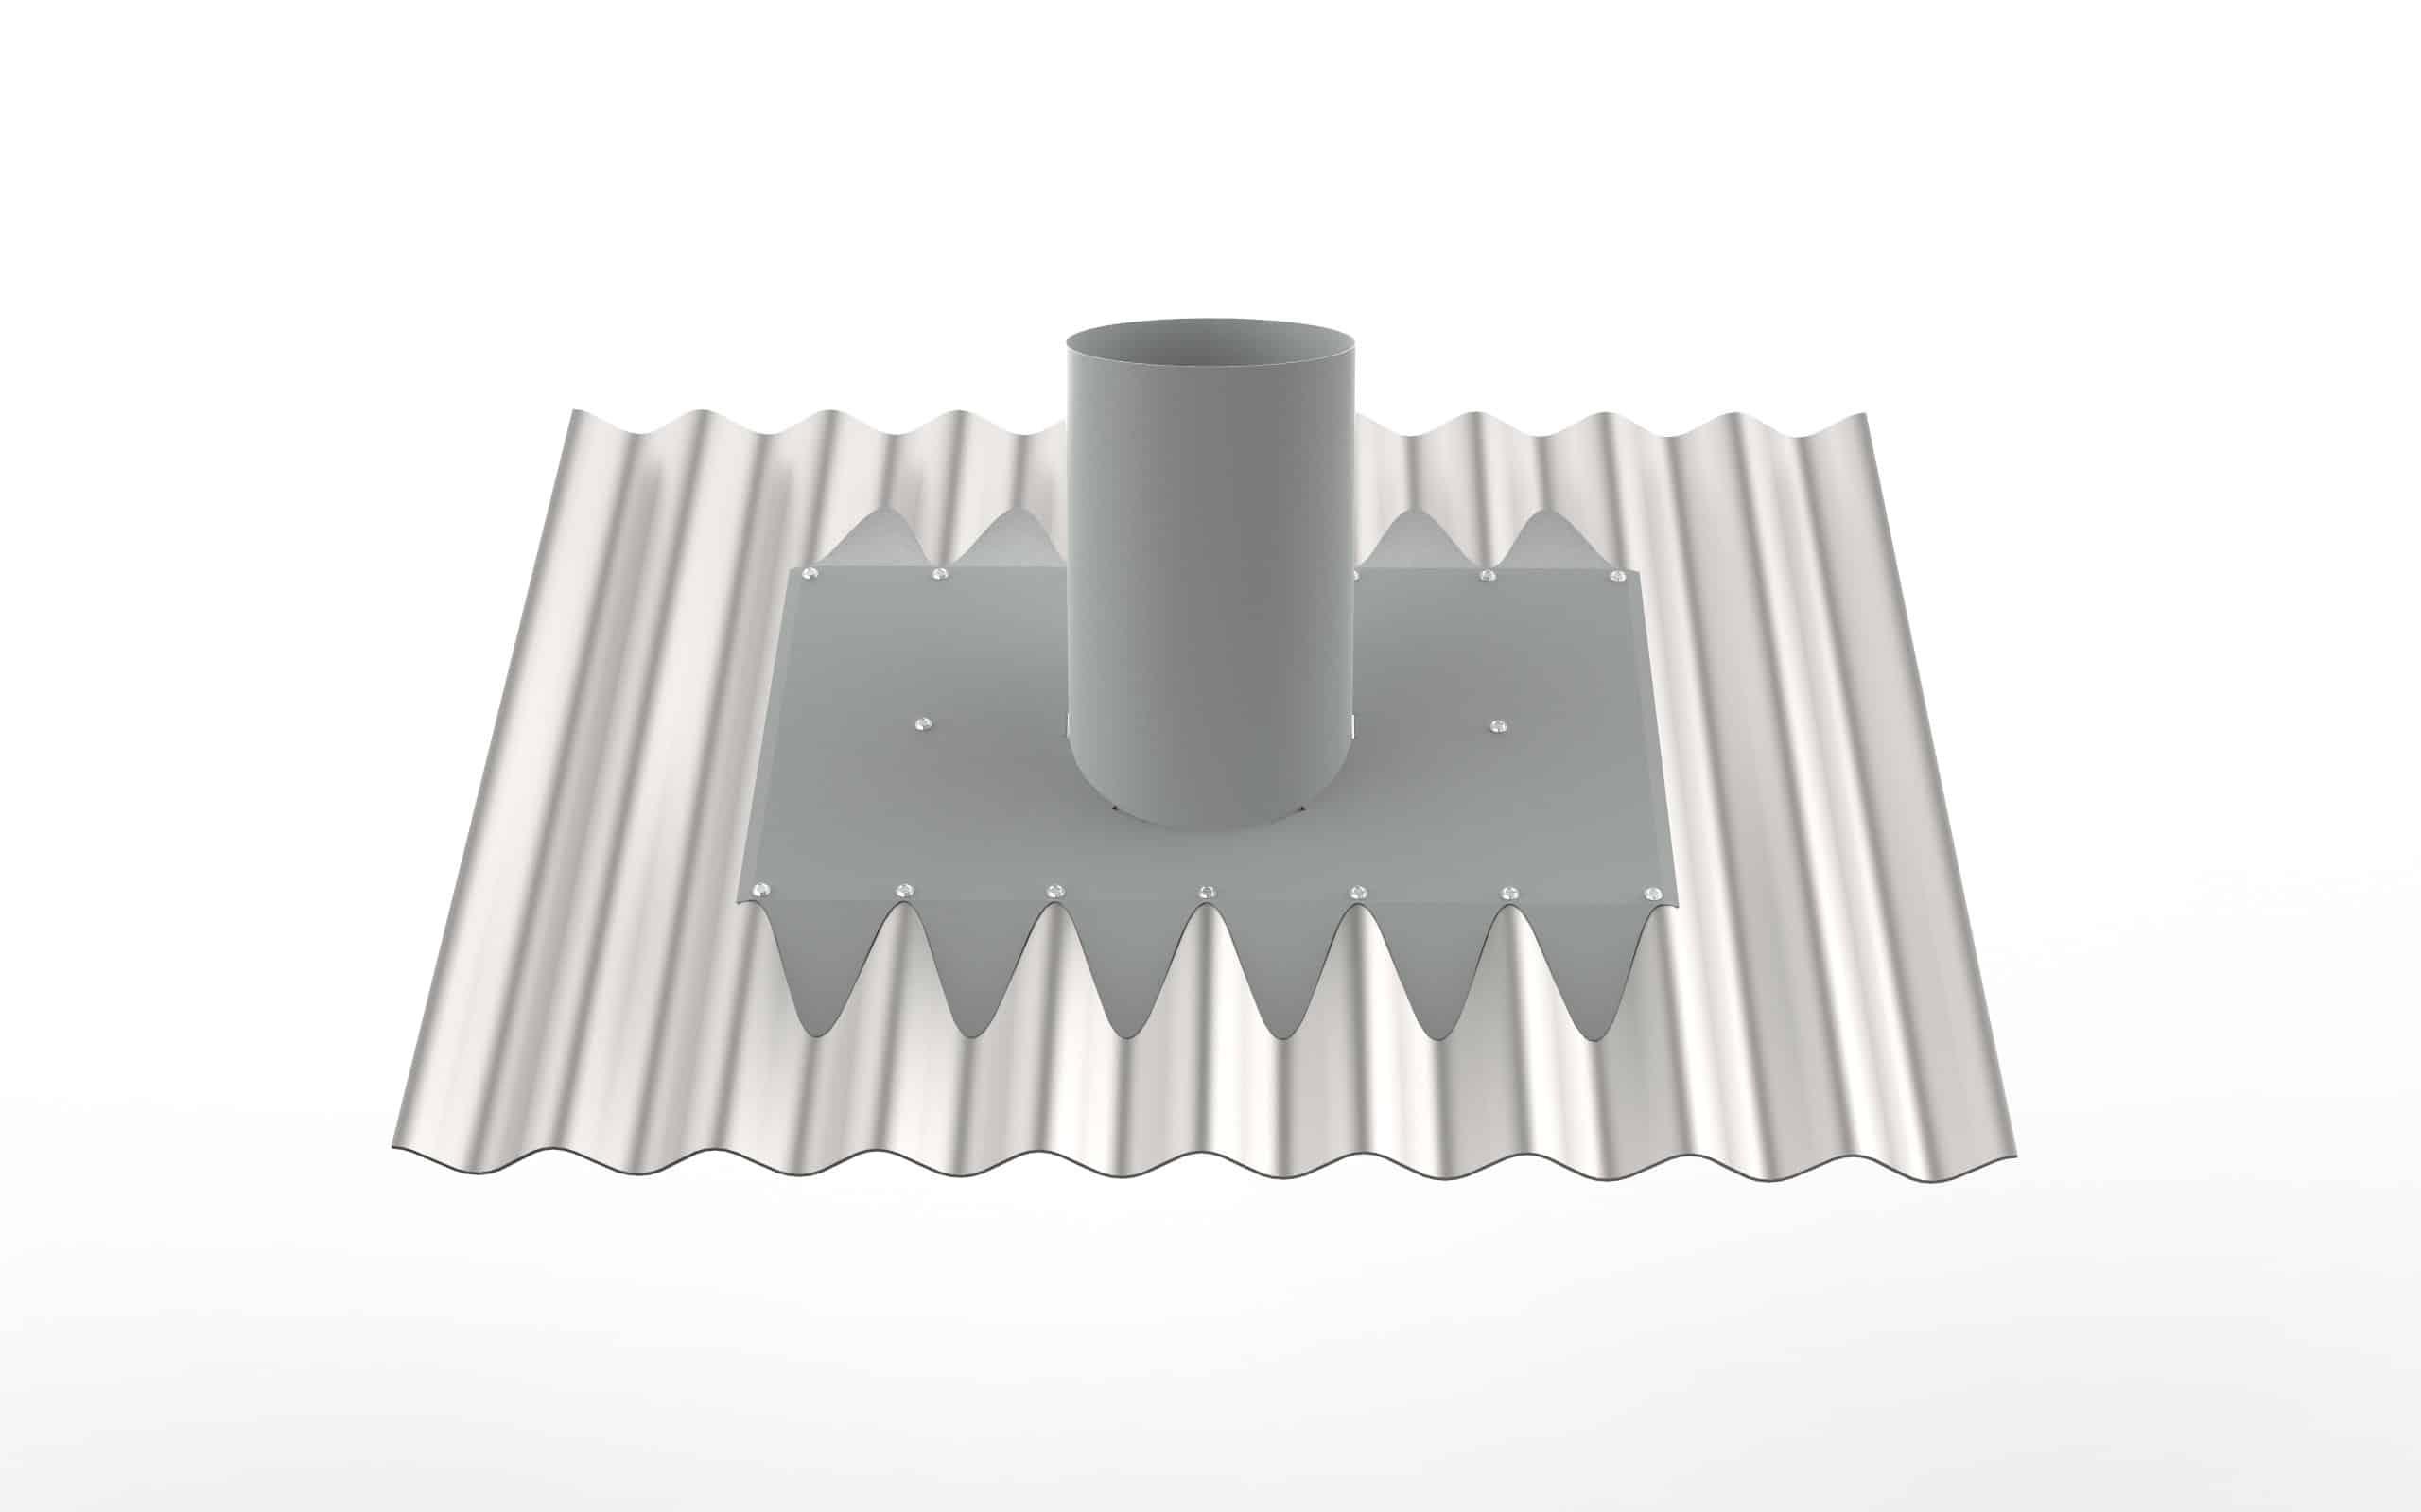 Corrugated Roof Vent Kit